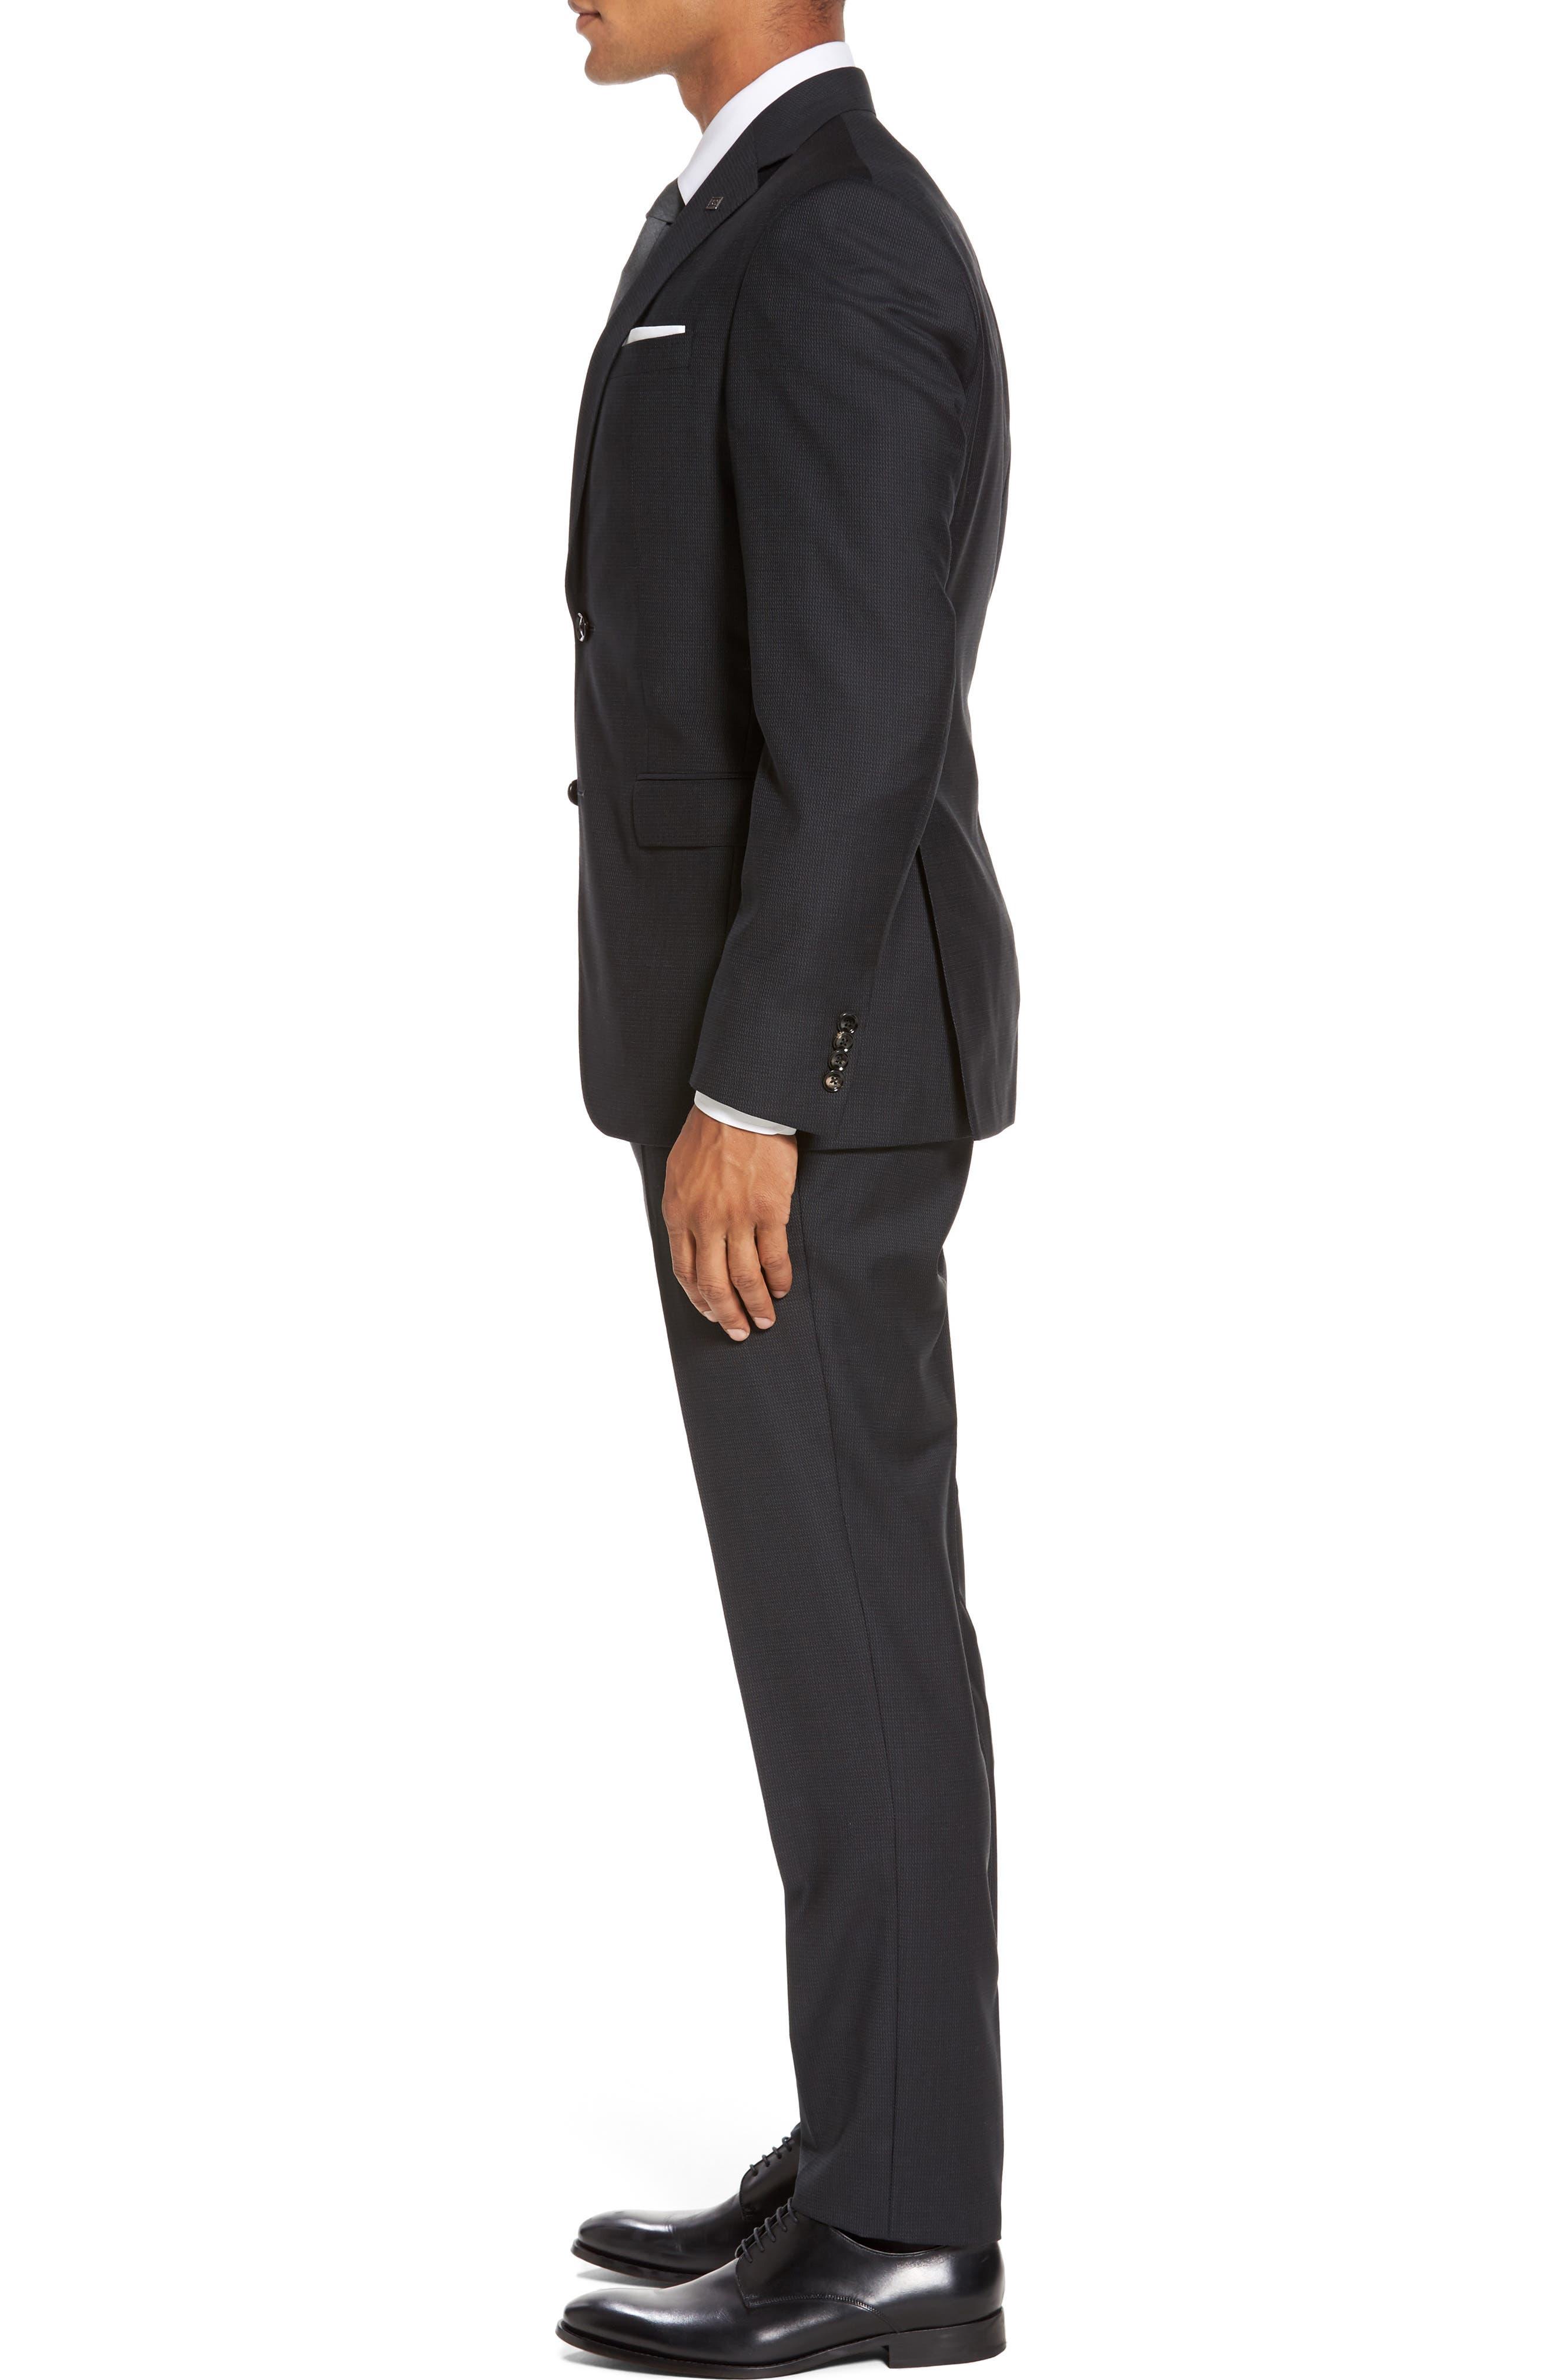 Roger Trim Fit Solid Wool Suit,                             Alternate thumbnail 3, color,                             001